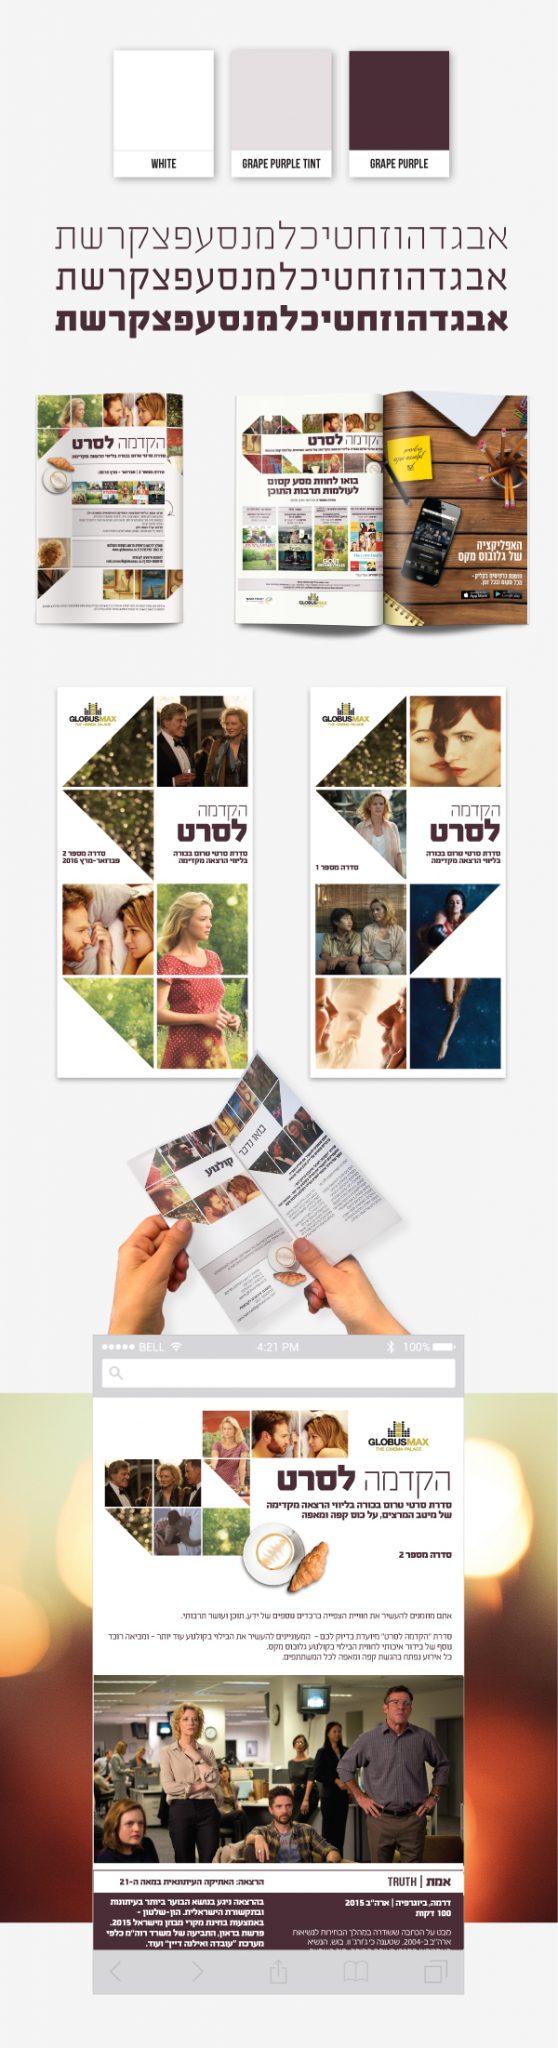 branding, design, graphic design, brochure, ad, ads, newsletter